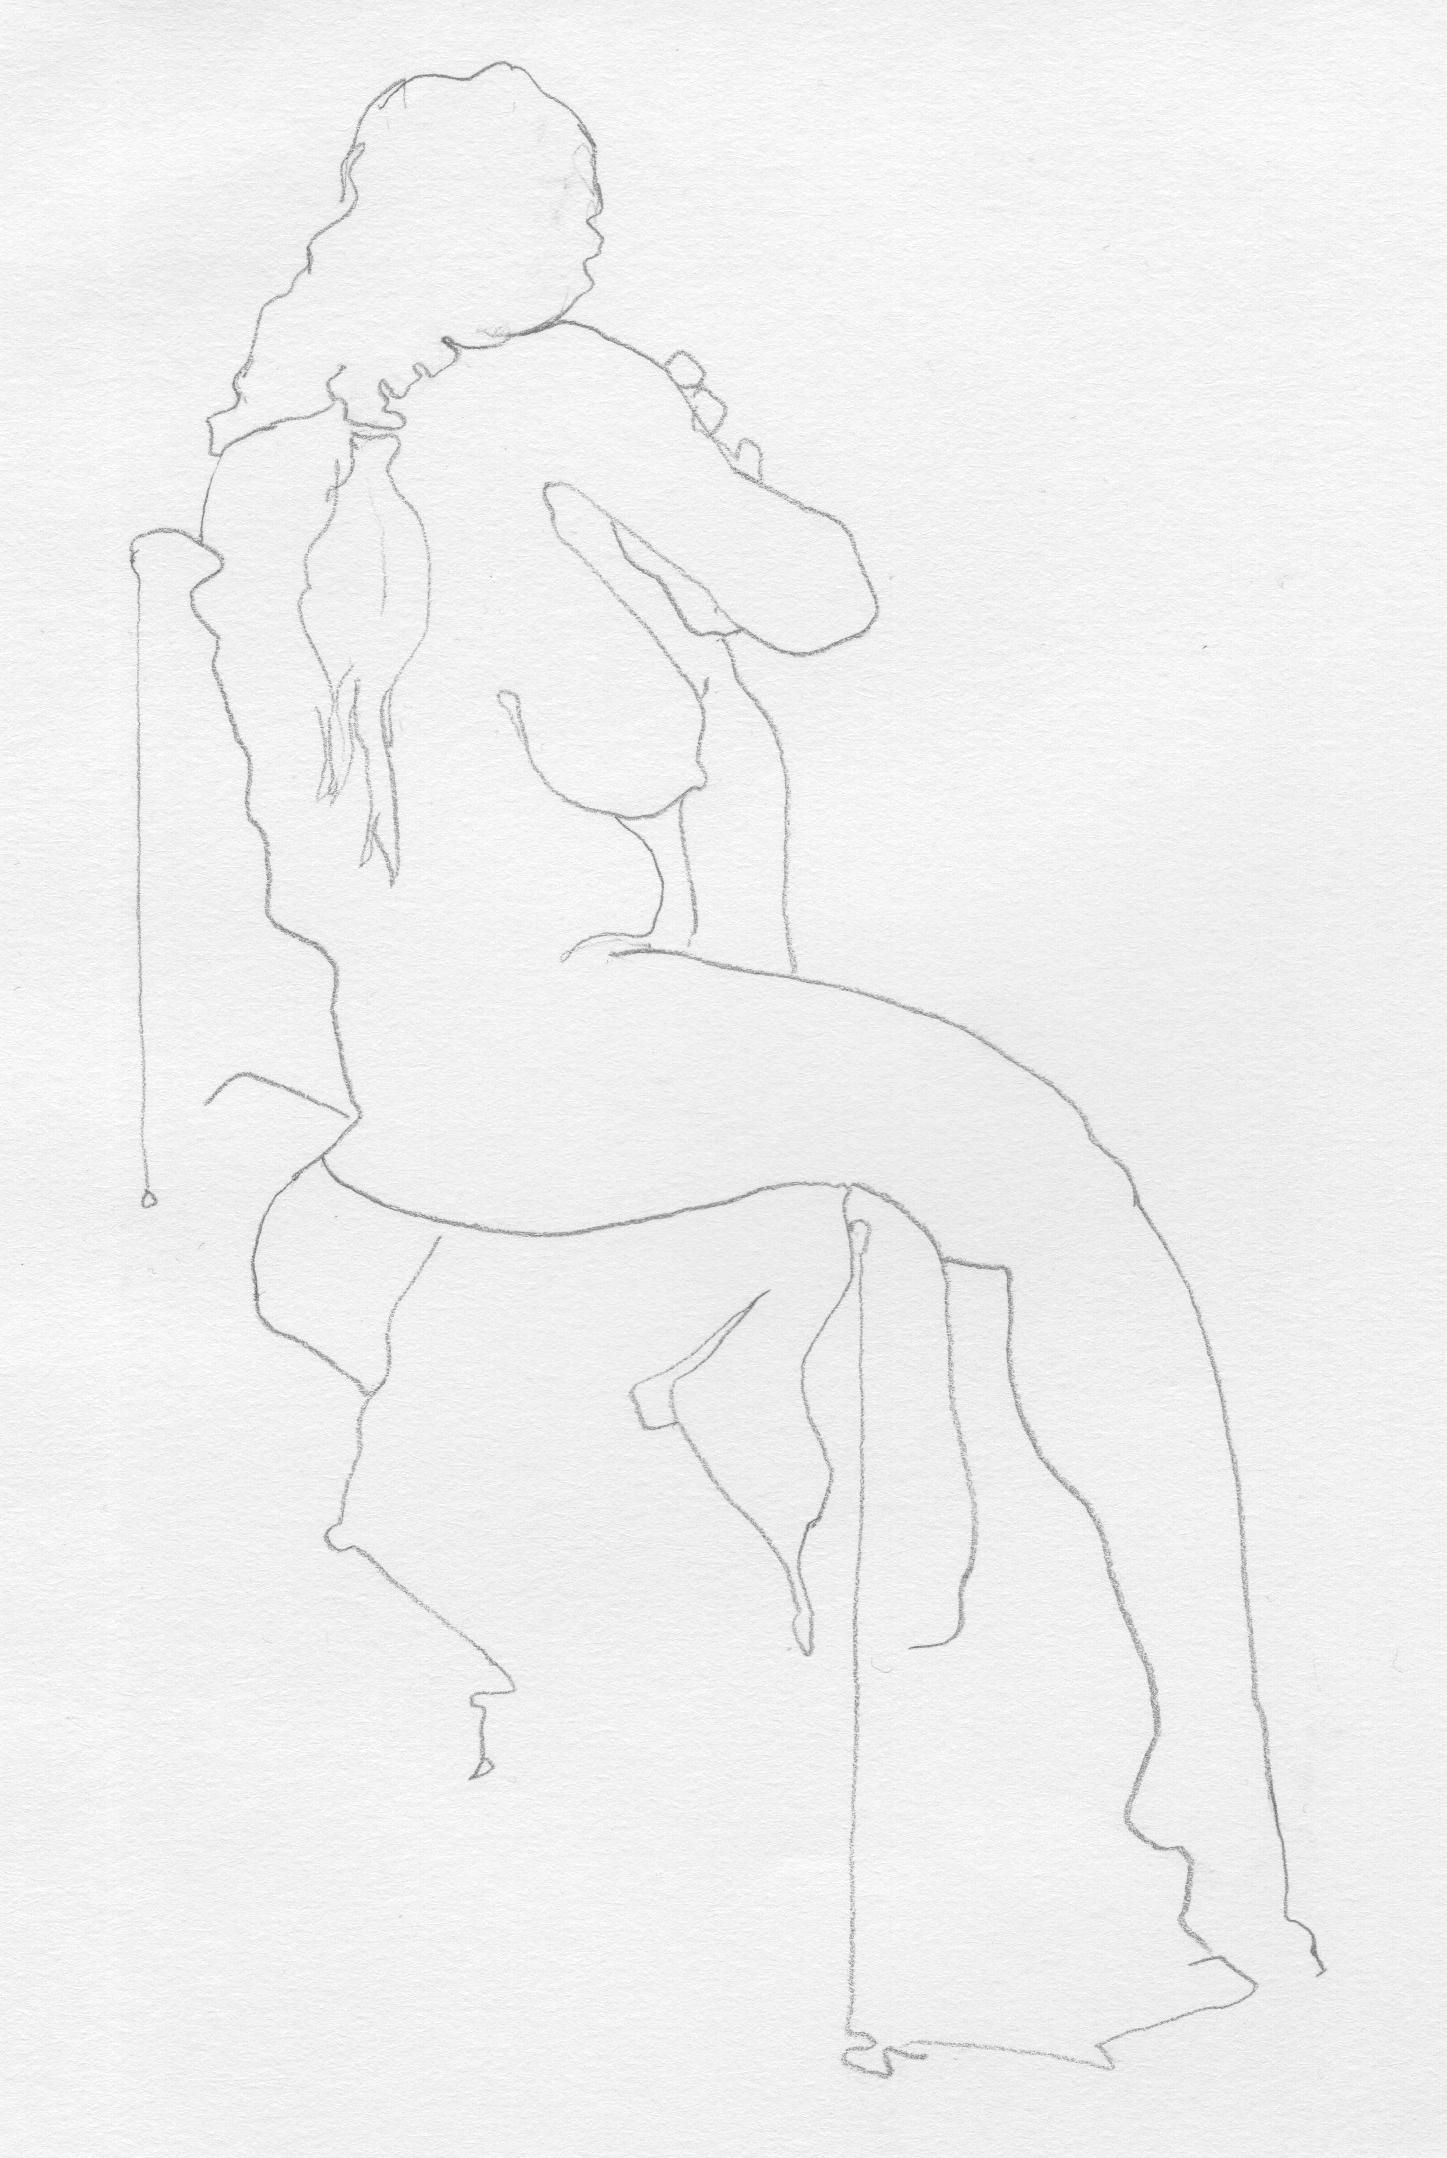 2016_Sketch_F-Beudin_Angelique_06